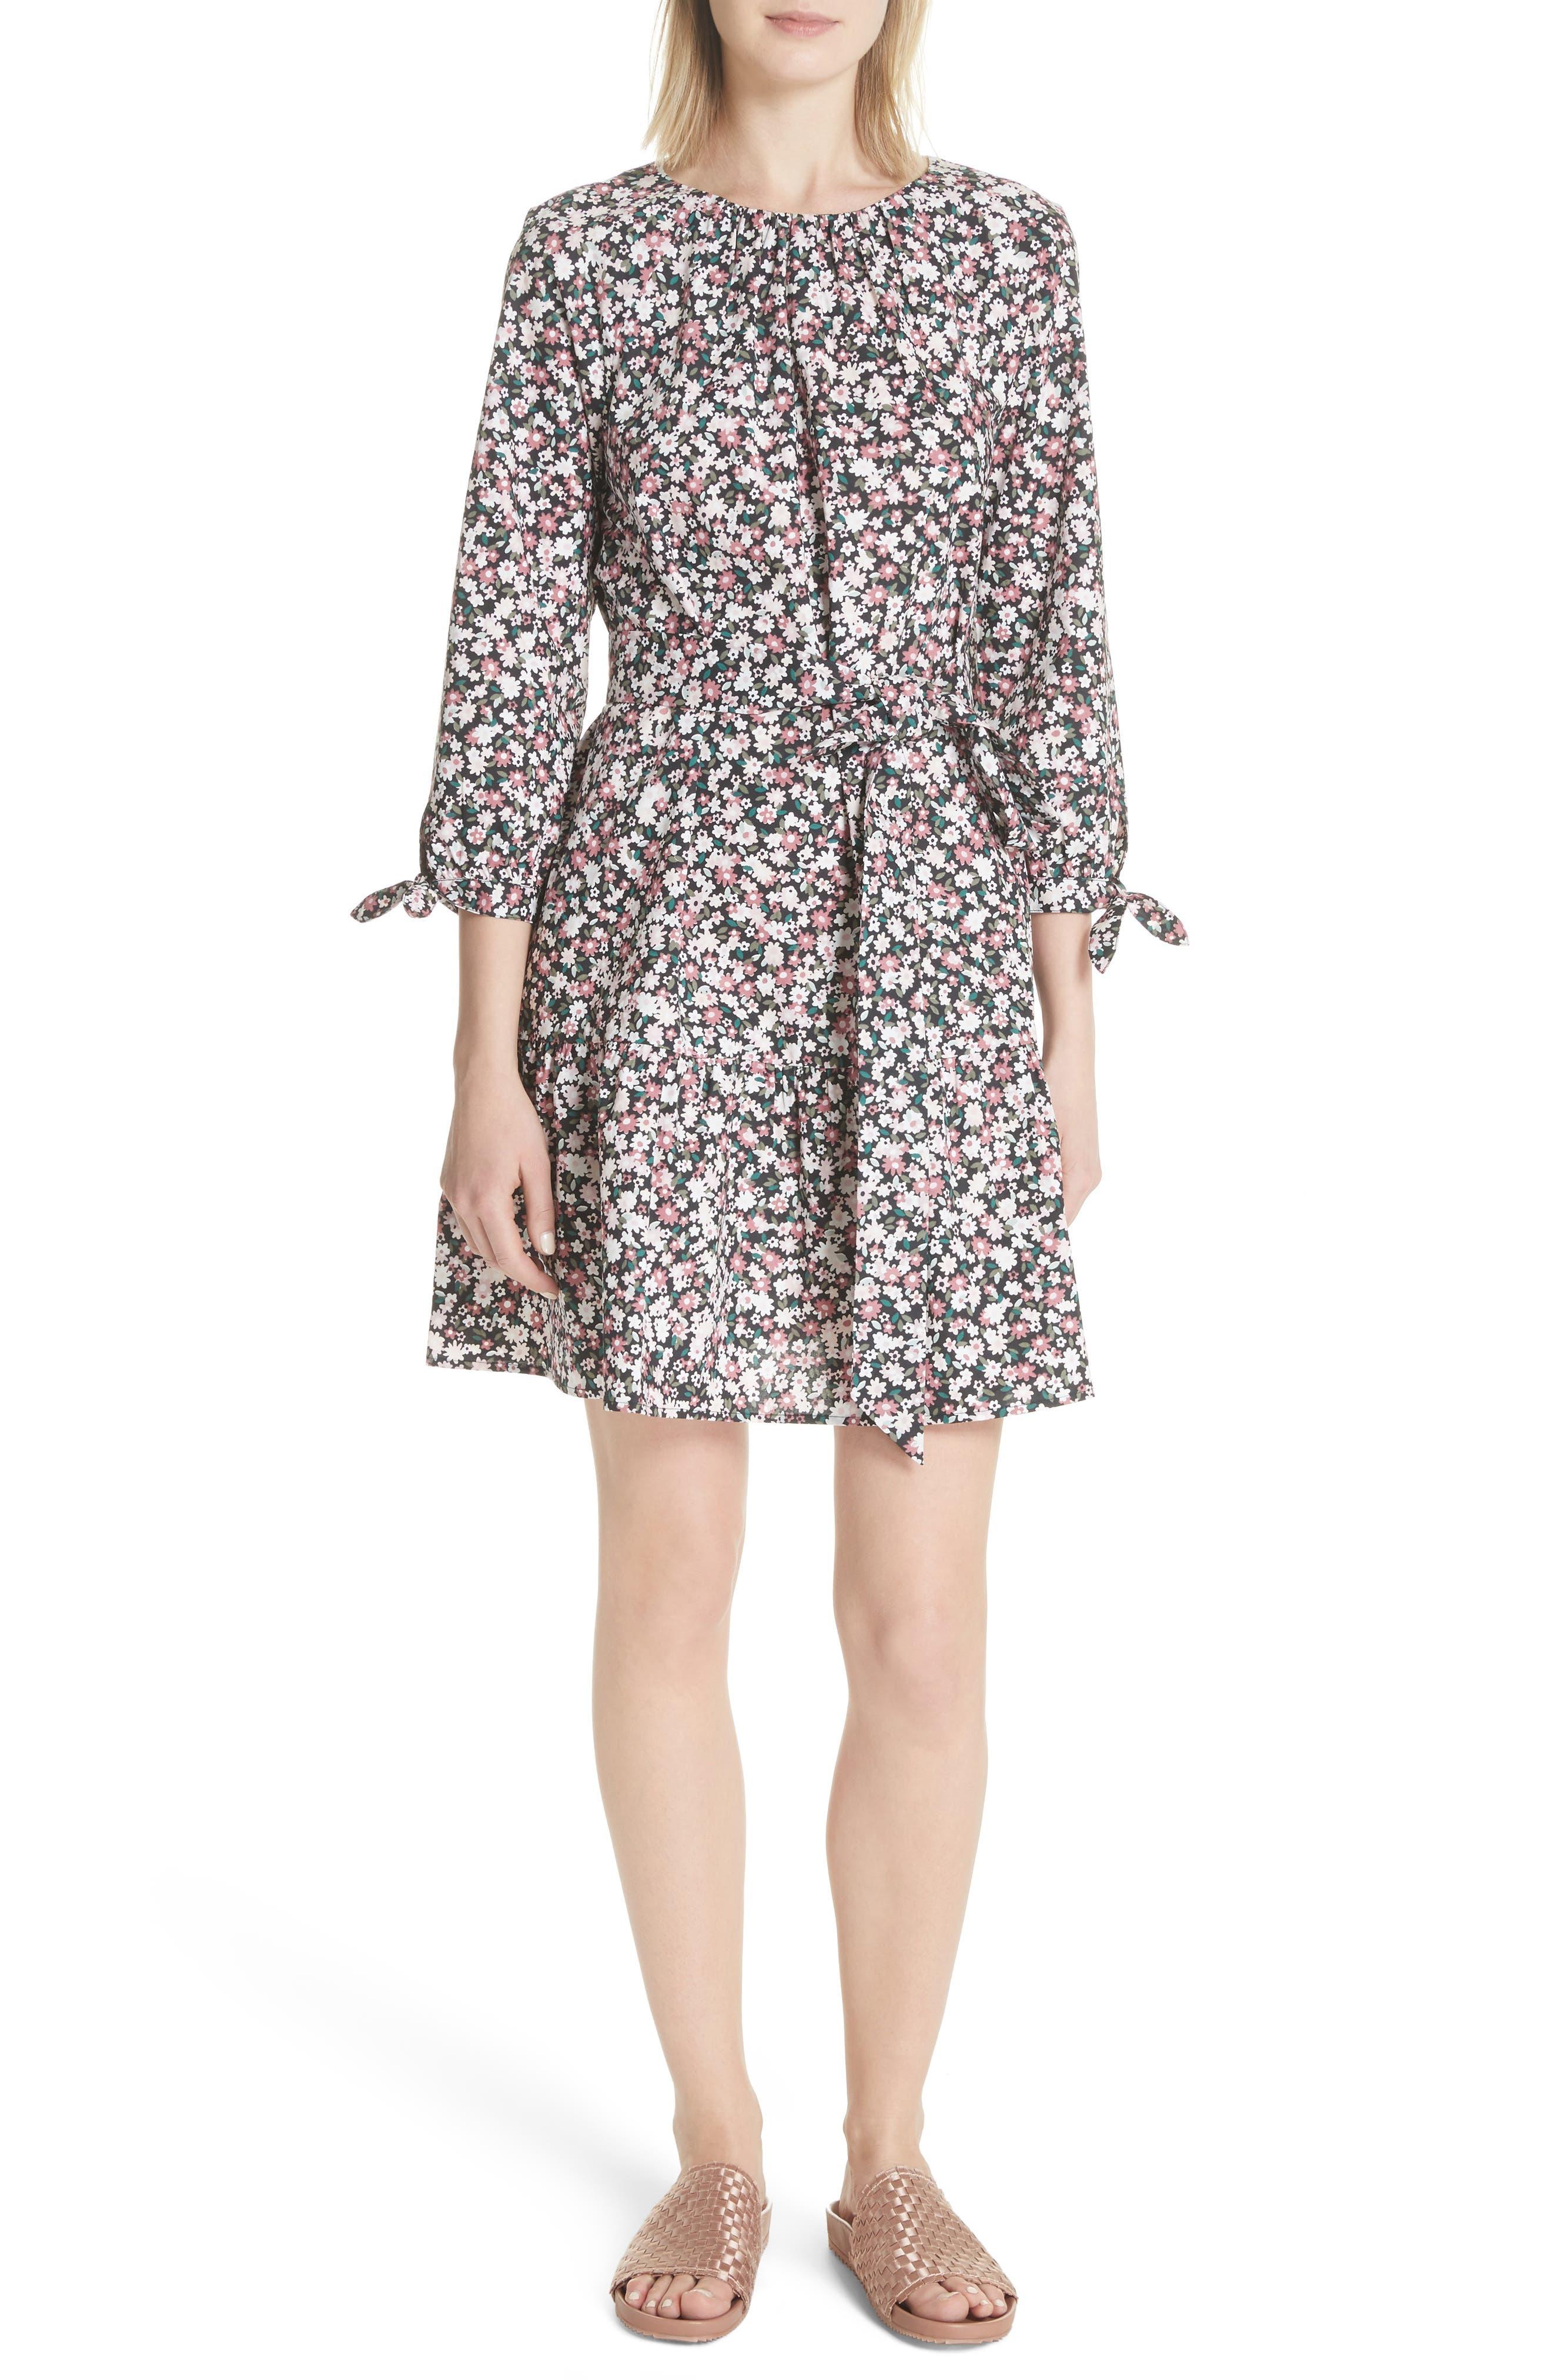 wildflower poplin dress,                             Main thumbnail 1, color,                             001